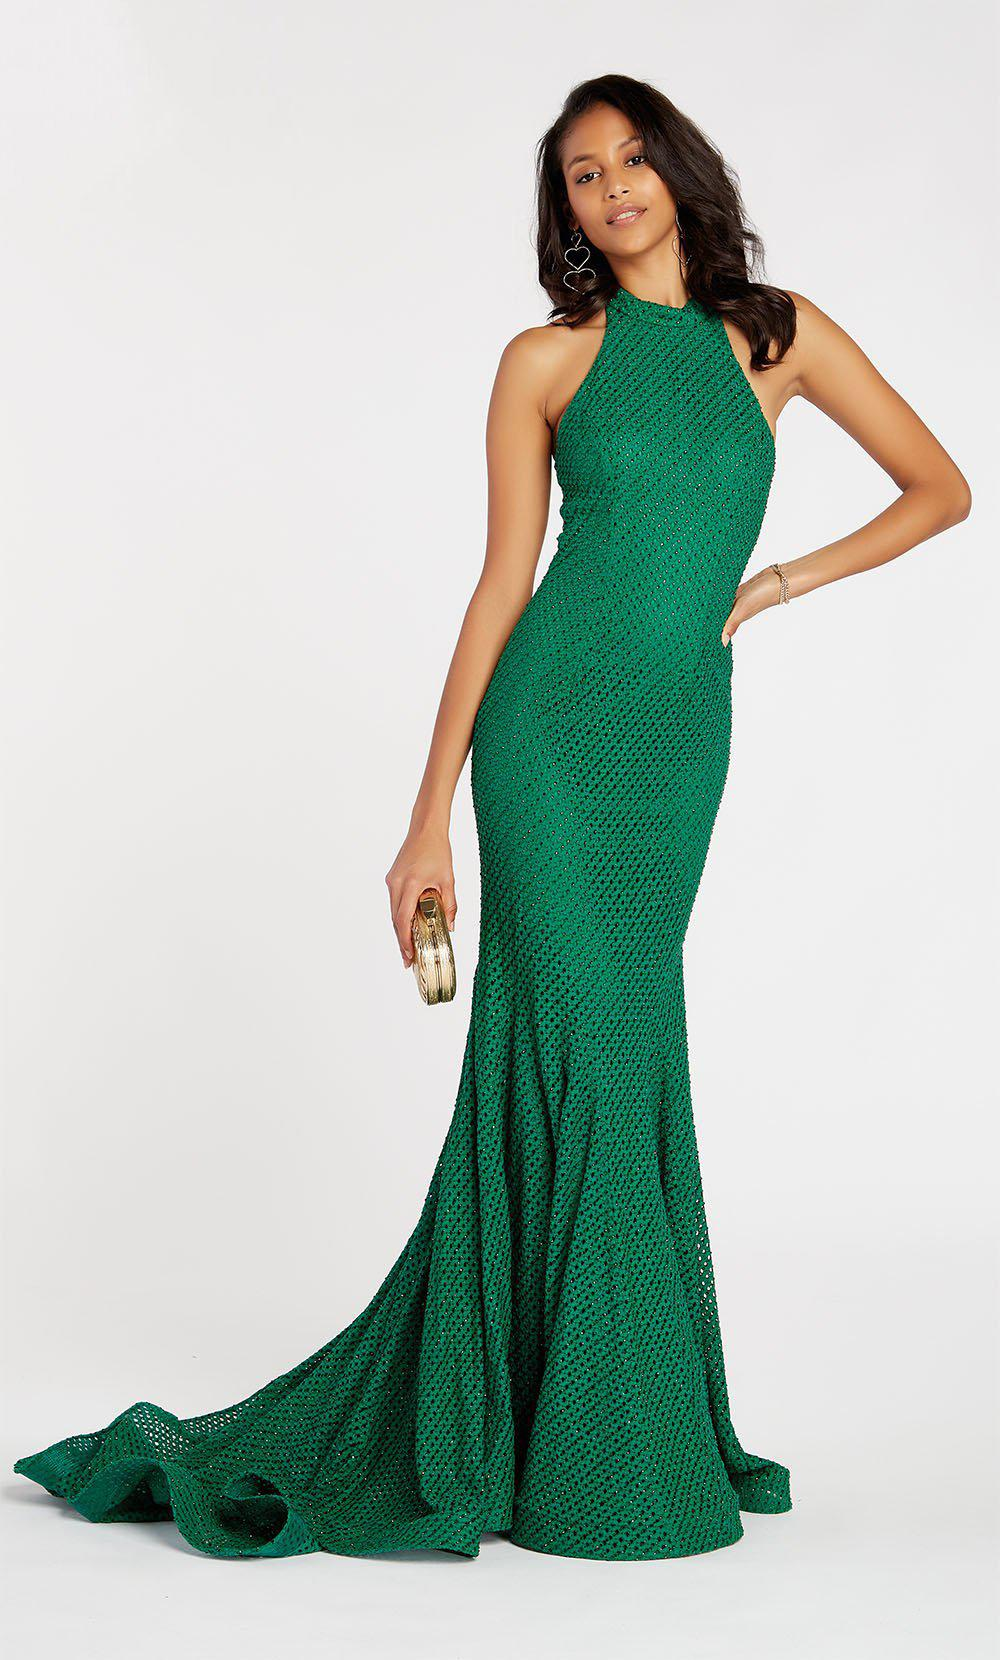 db95bea081 Lyst - Alyce Paris 60317 Diamond Lace High Halter Trumpet Dress in Green